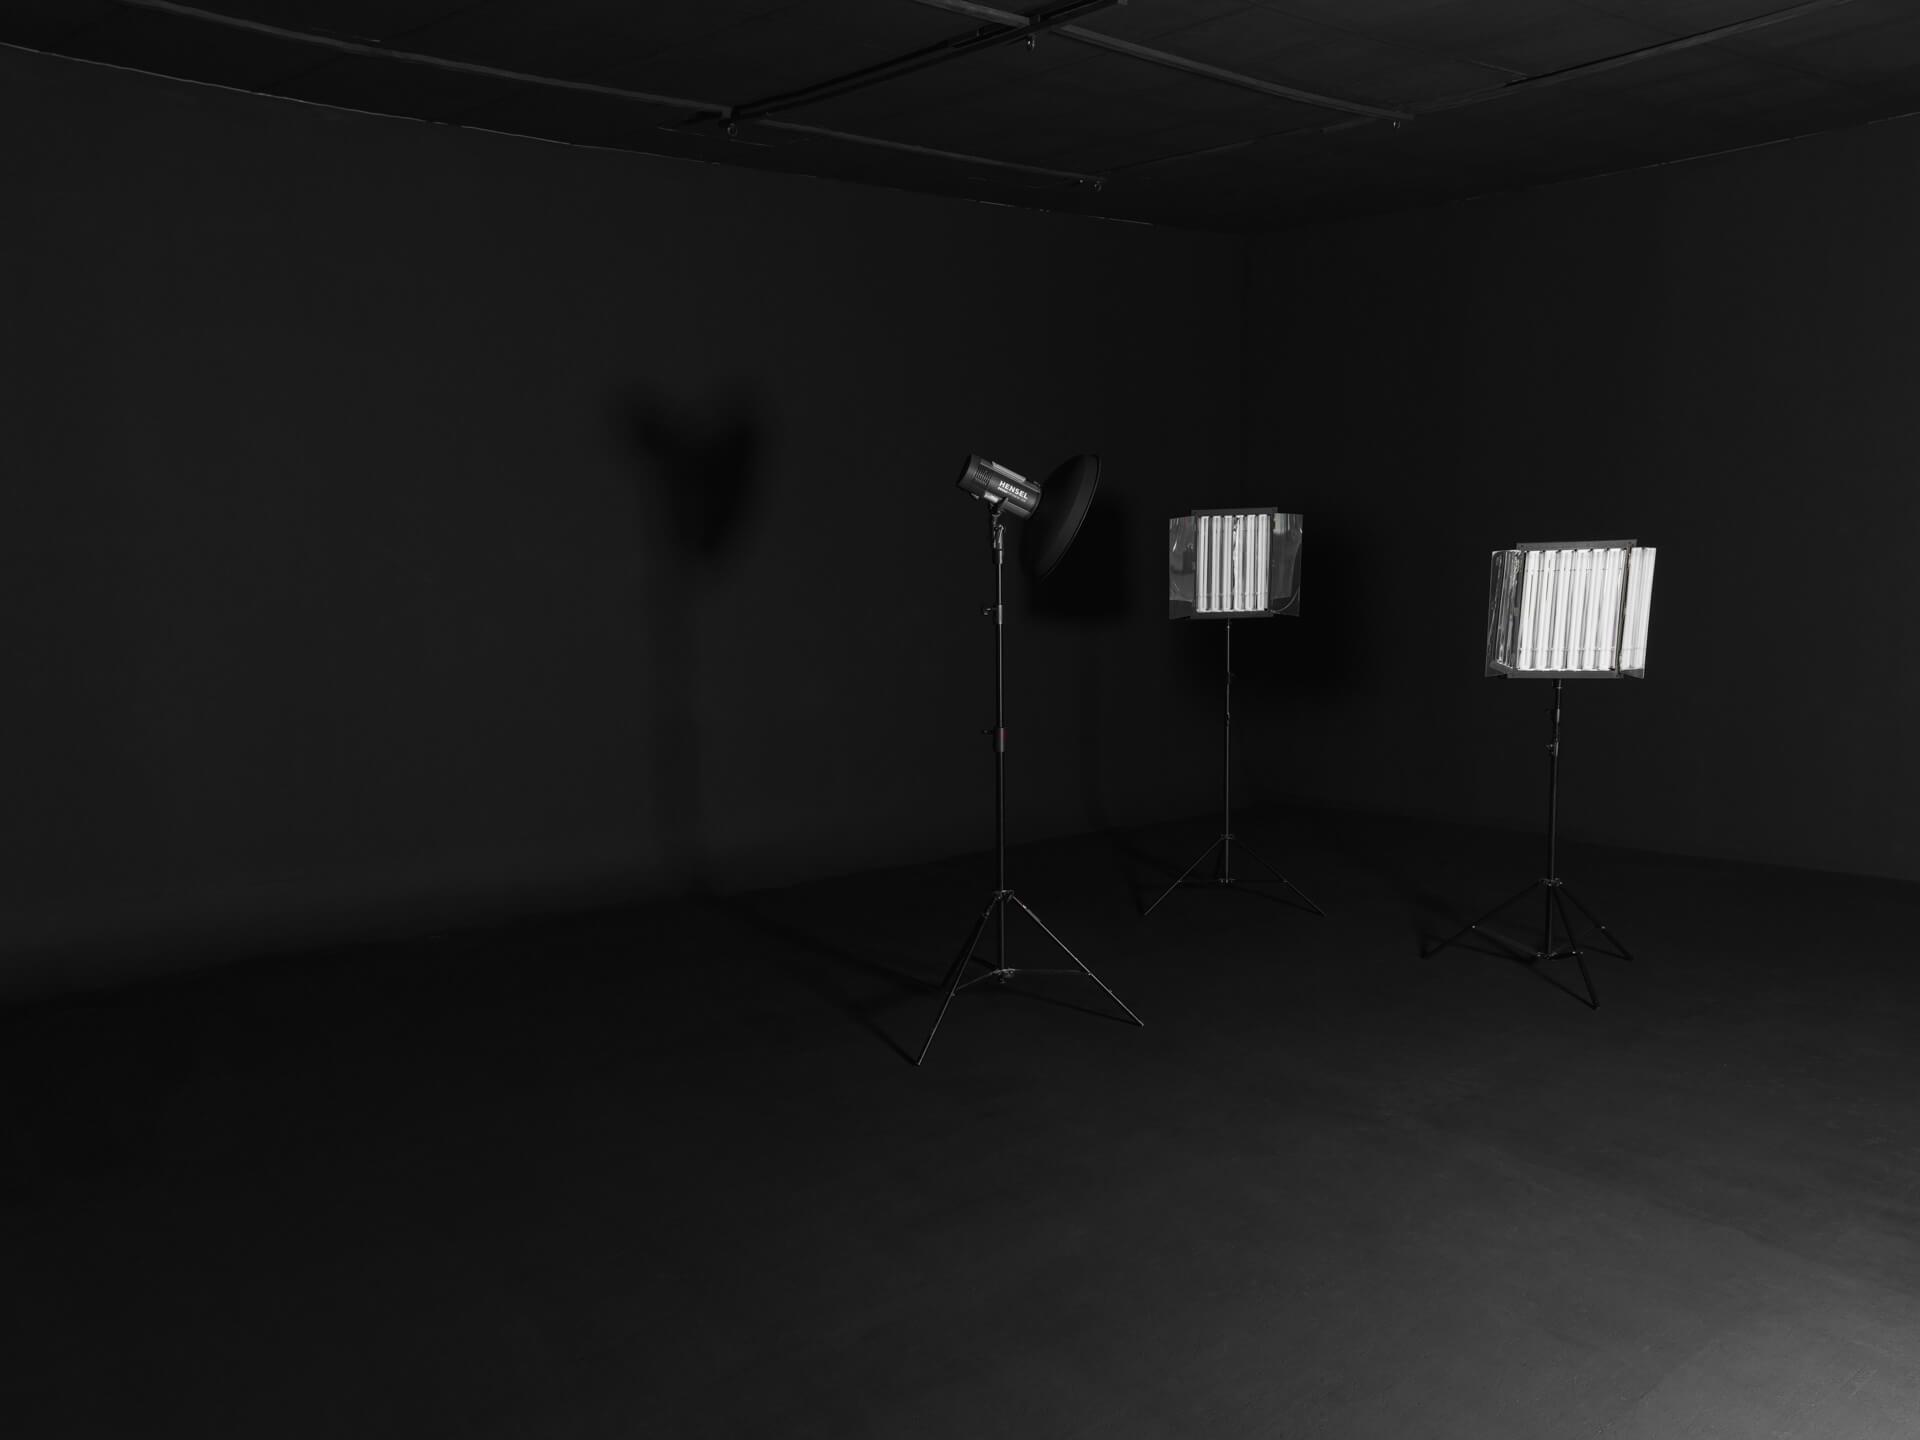 Das schwarze Studio